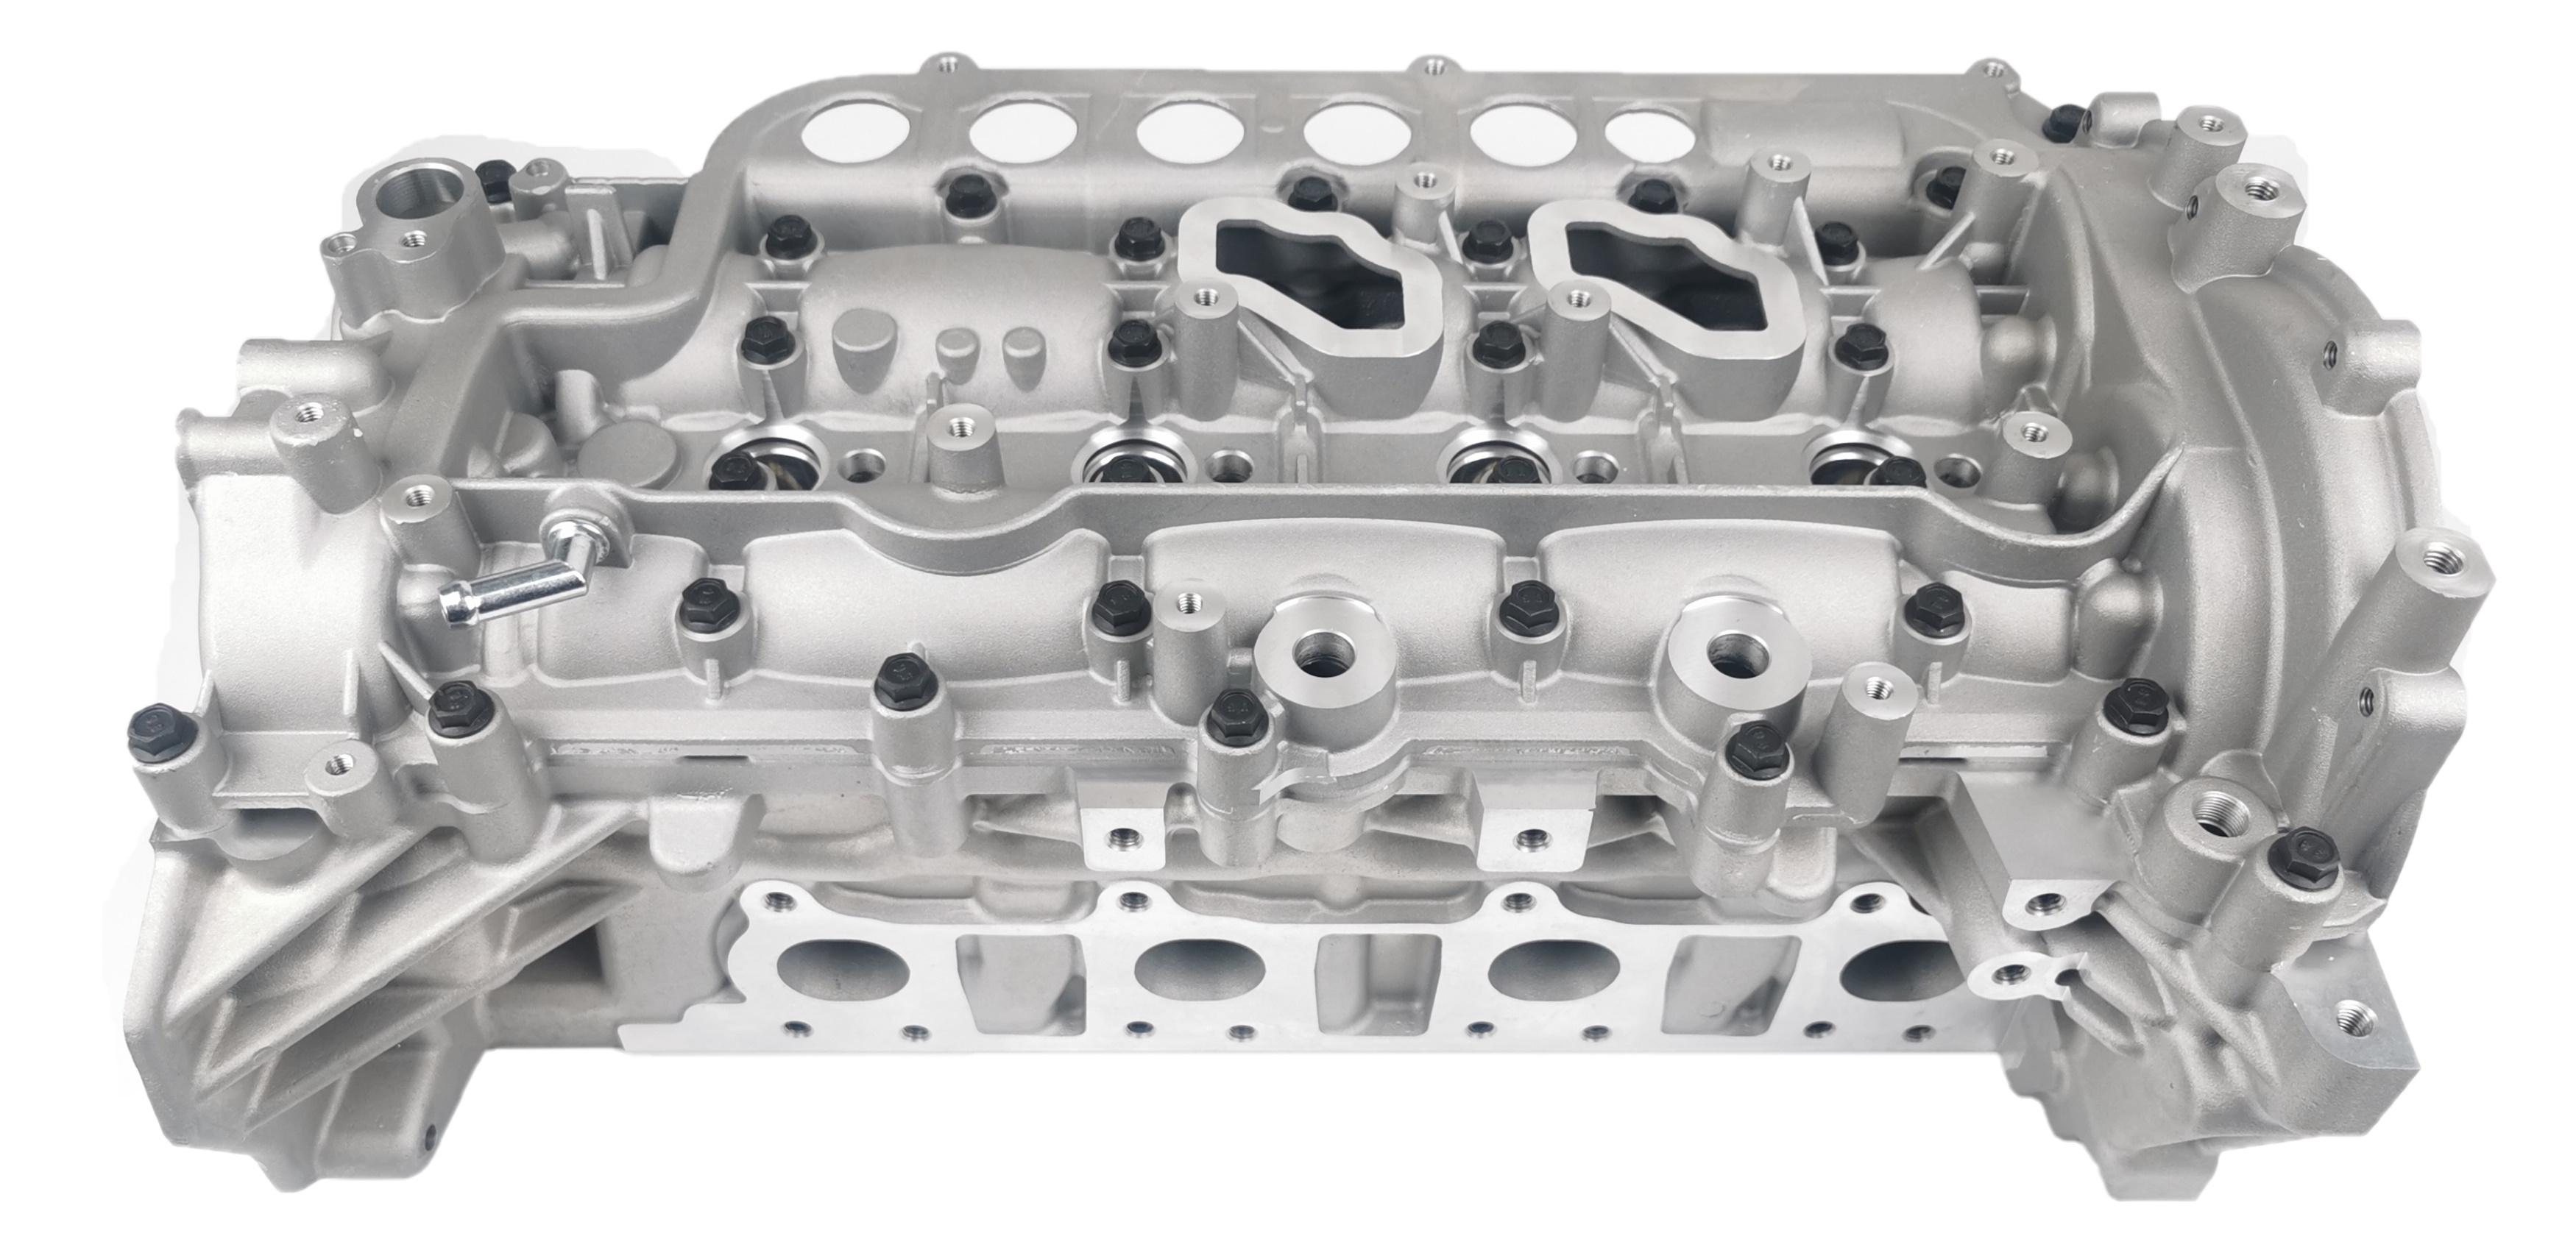 Zylinderkopf für Nissan Primastar Qashqai 2,0 dCi M9R780 M9R782 M9R784 NEU